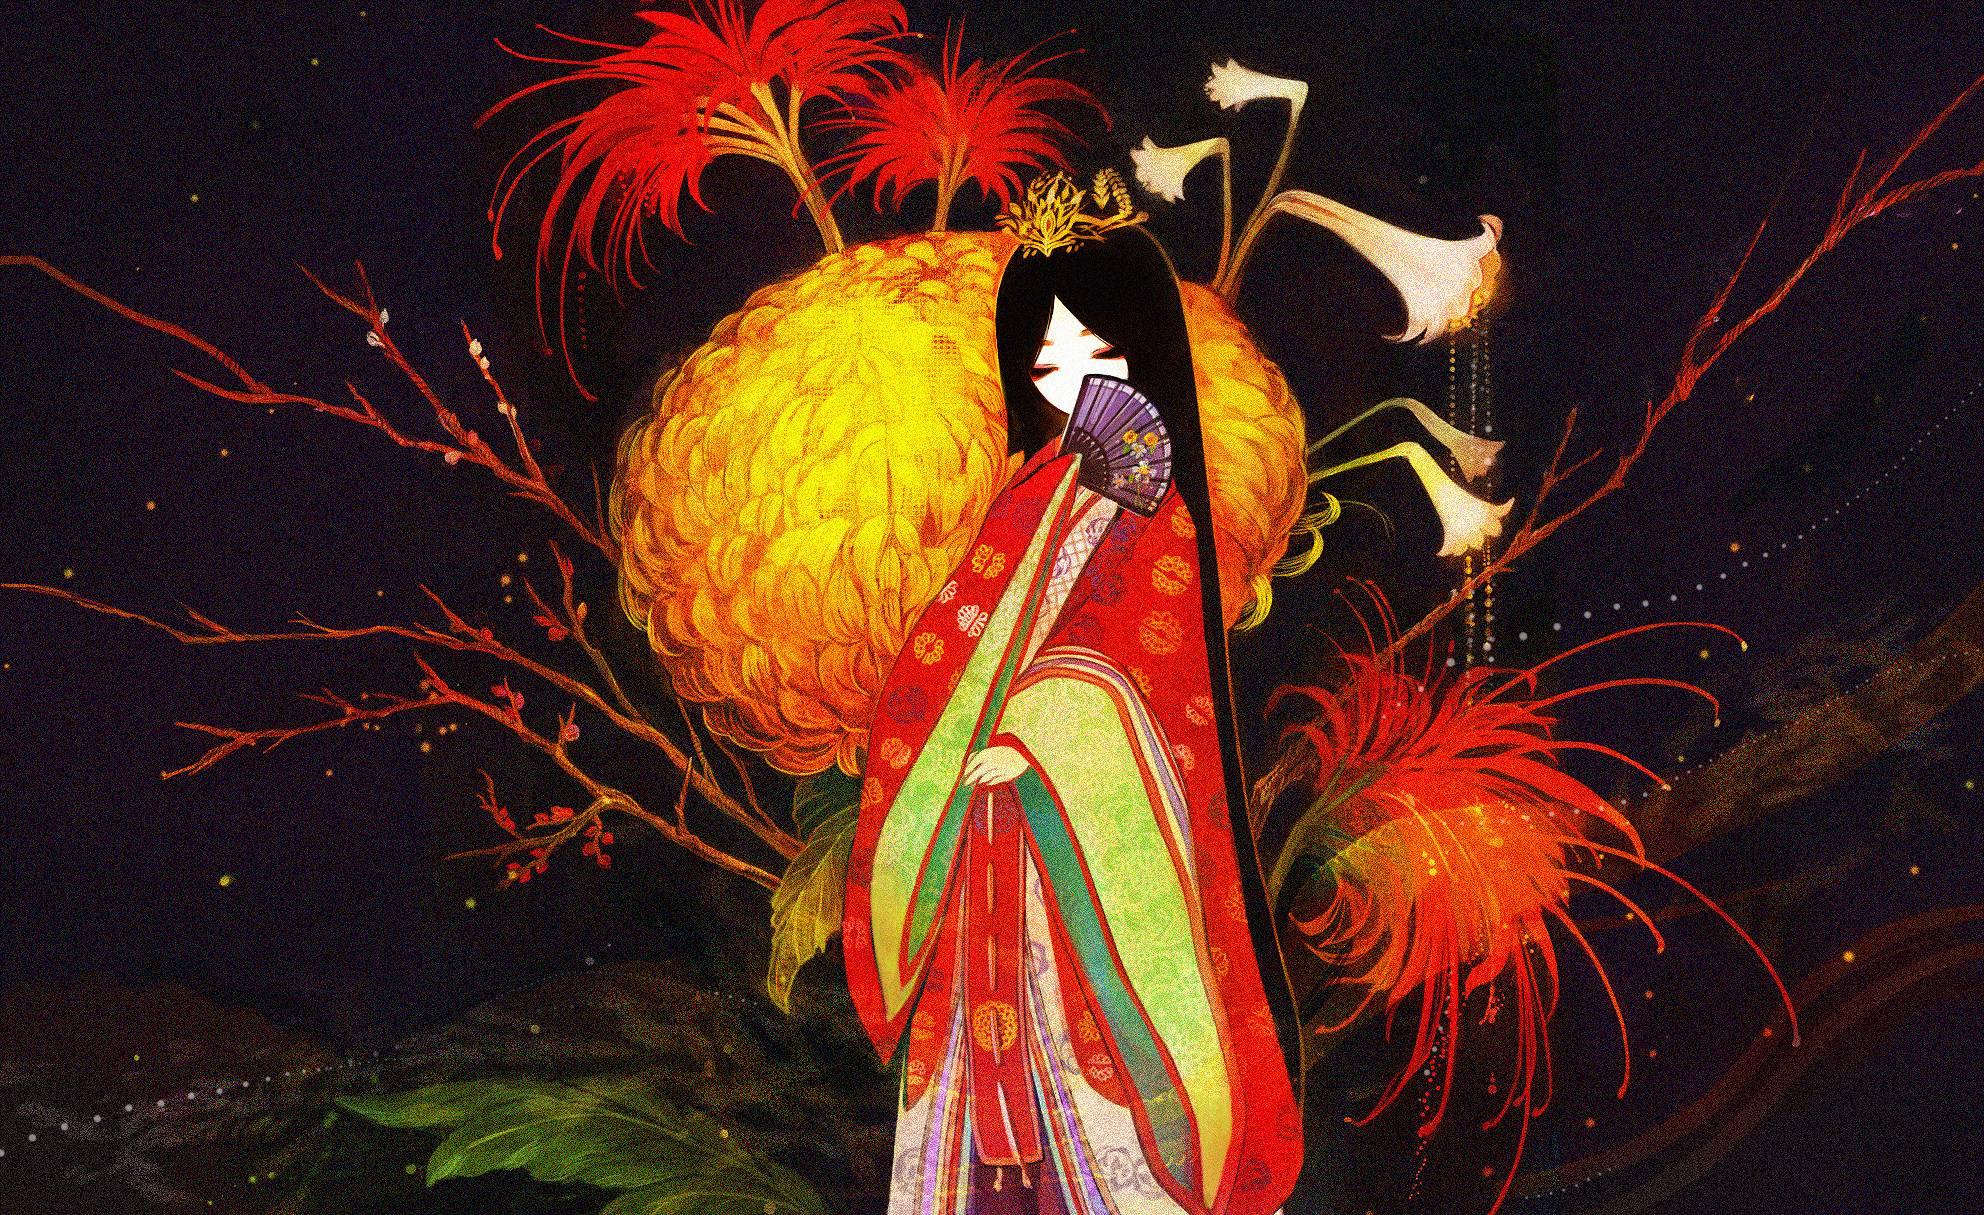 Ayu in a Kimono Wallpaper by francisco on DeviantArt